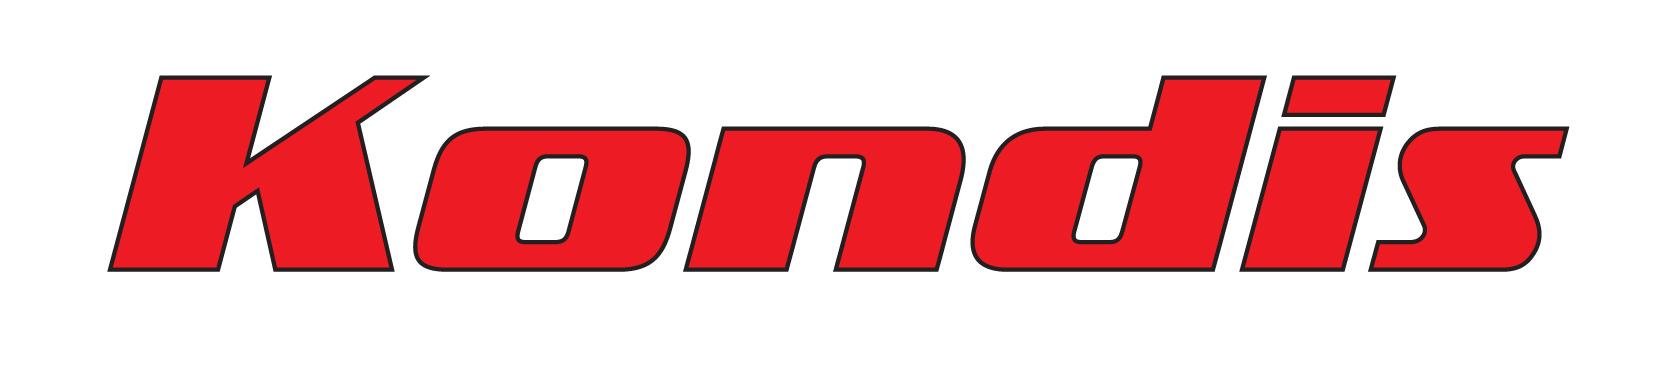 kondis logo_redk2012[2].jpg